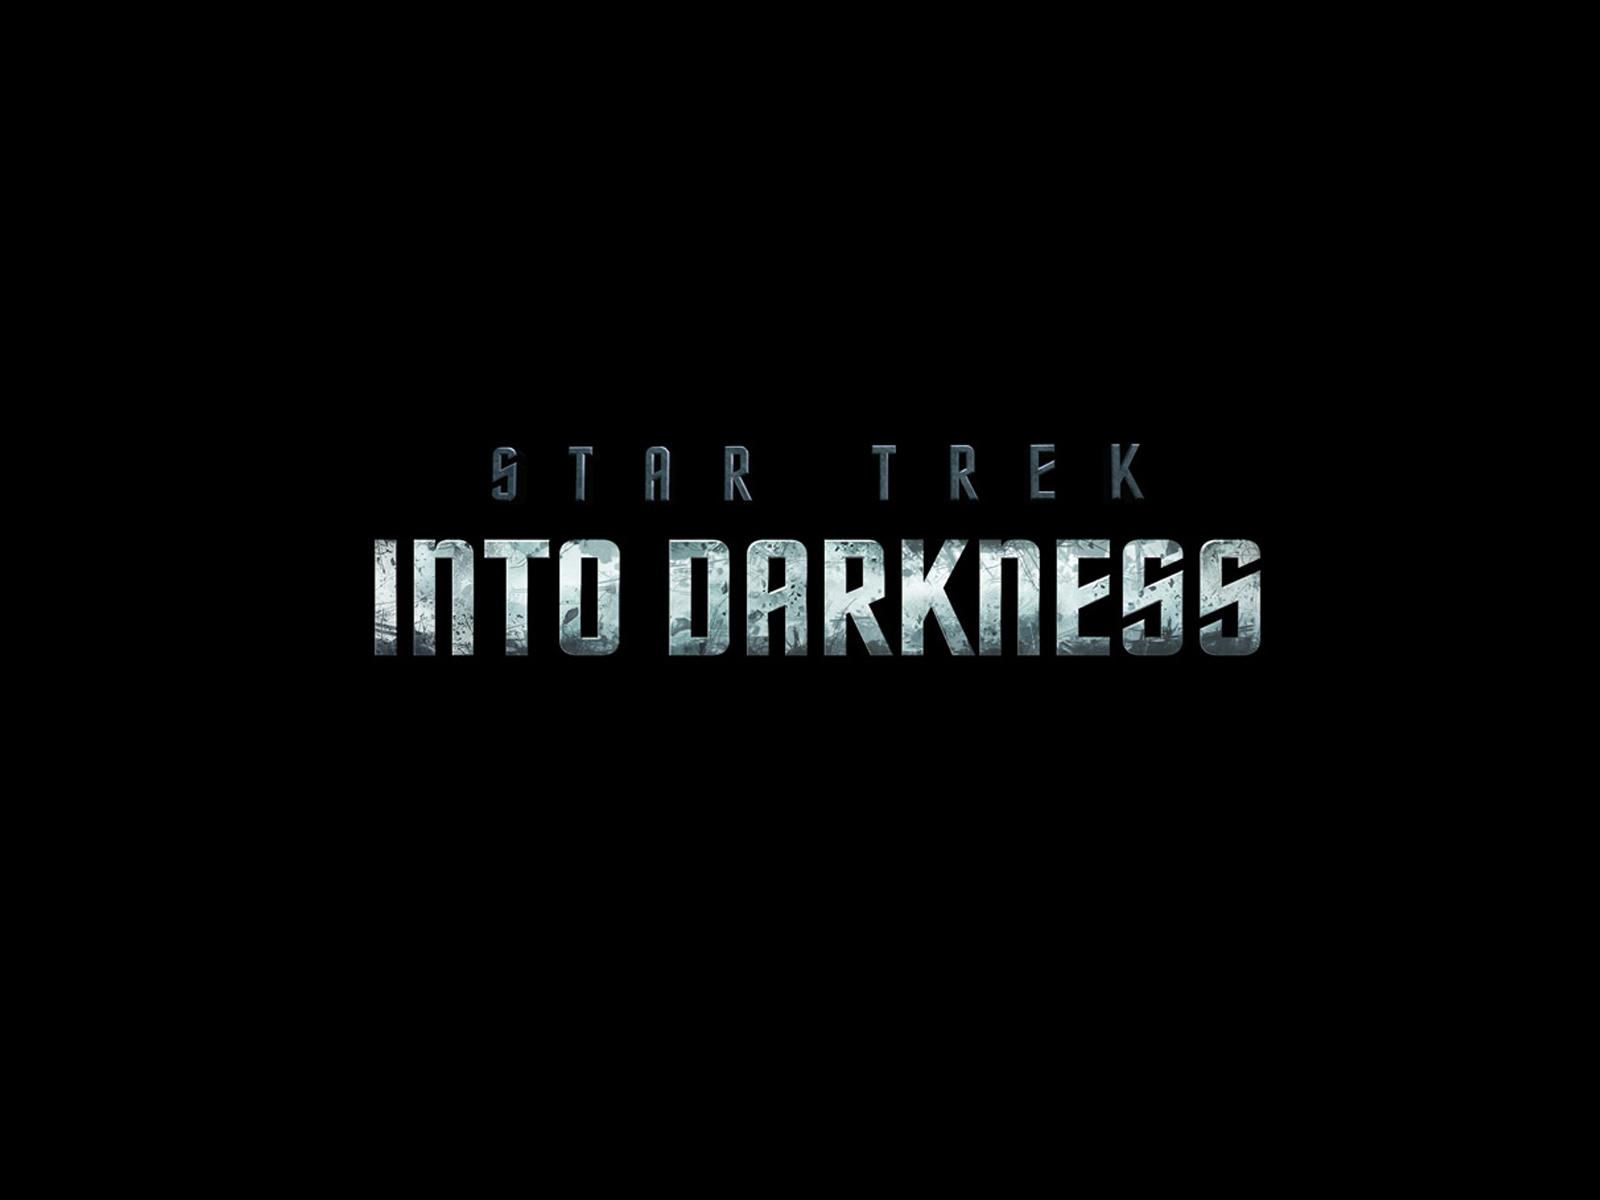 http://3.bp.blogspot.com/-XiNONMMnsW0/UMUN5GWWpeI/AAAAAAAAGnI/yKAWS1PsAaE/s1600/Star-Trek-Into-Darkness-Movie-Logo-HD-Wallpaper_Vvallpaper.Net.jpg